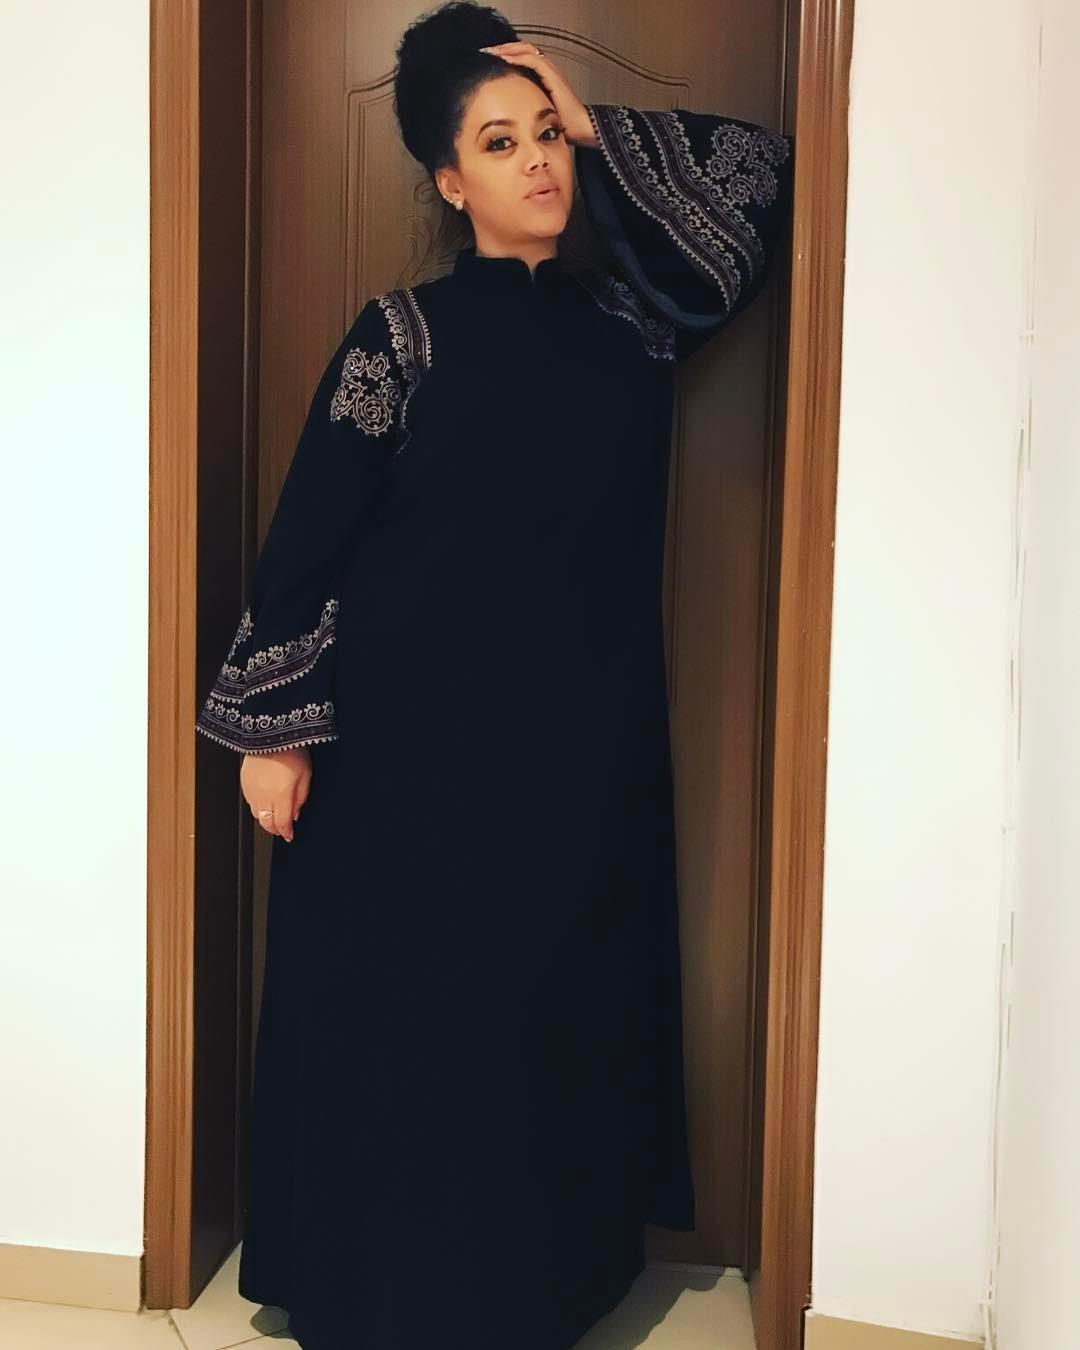 Nadia Buari 1